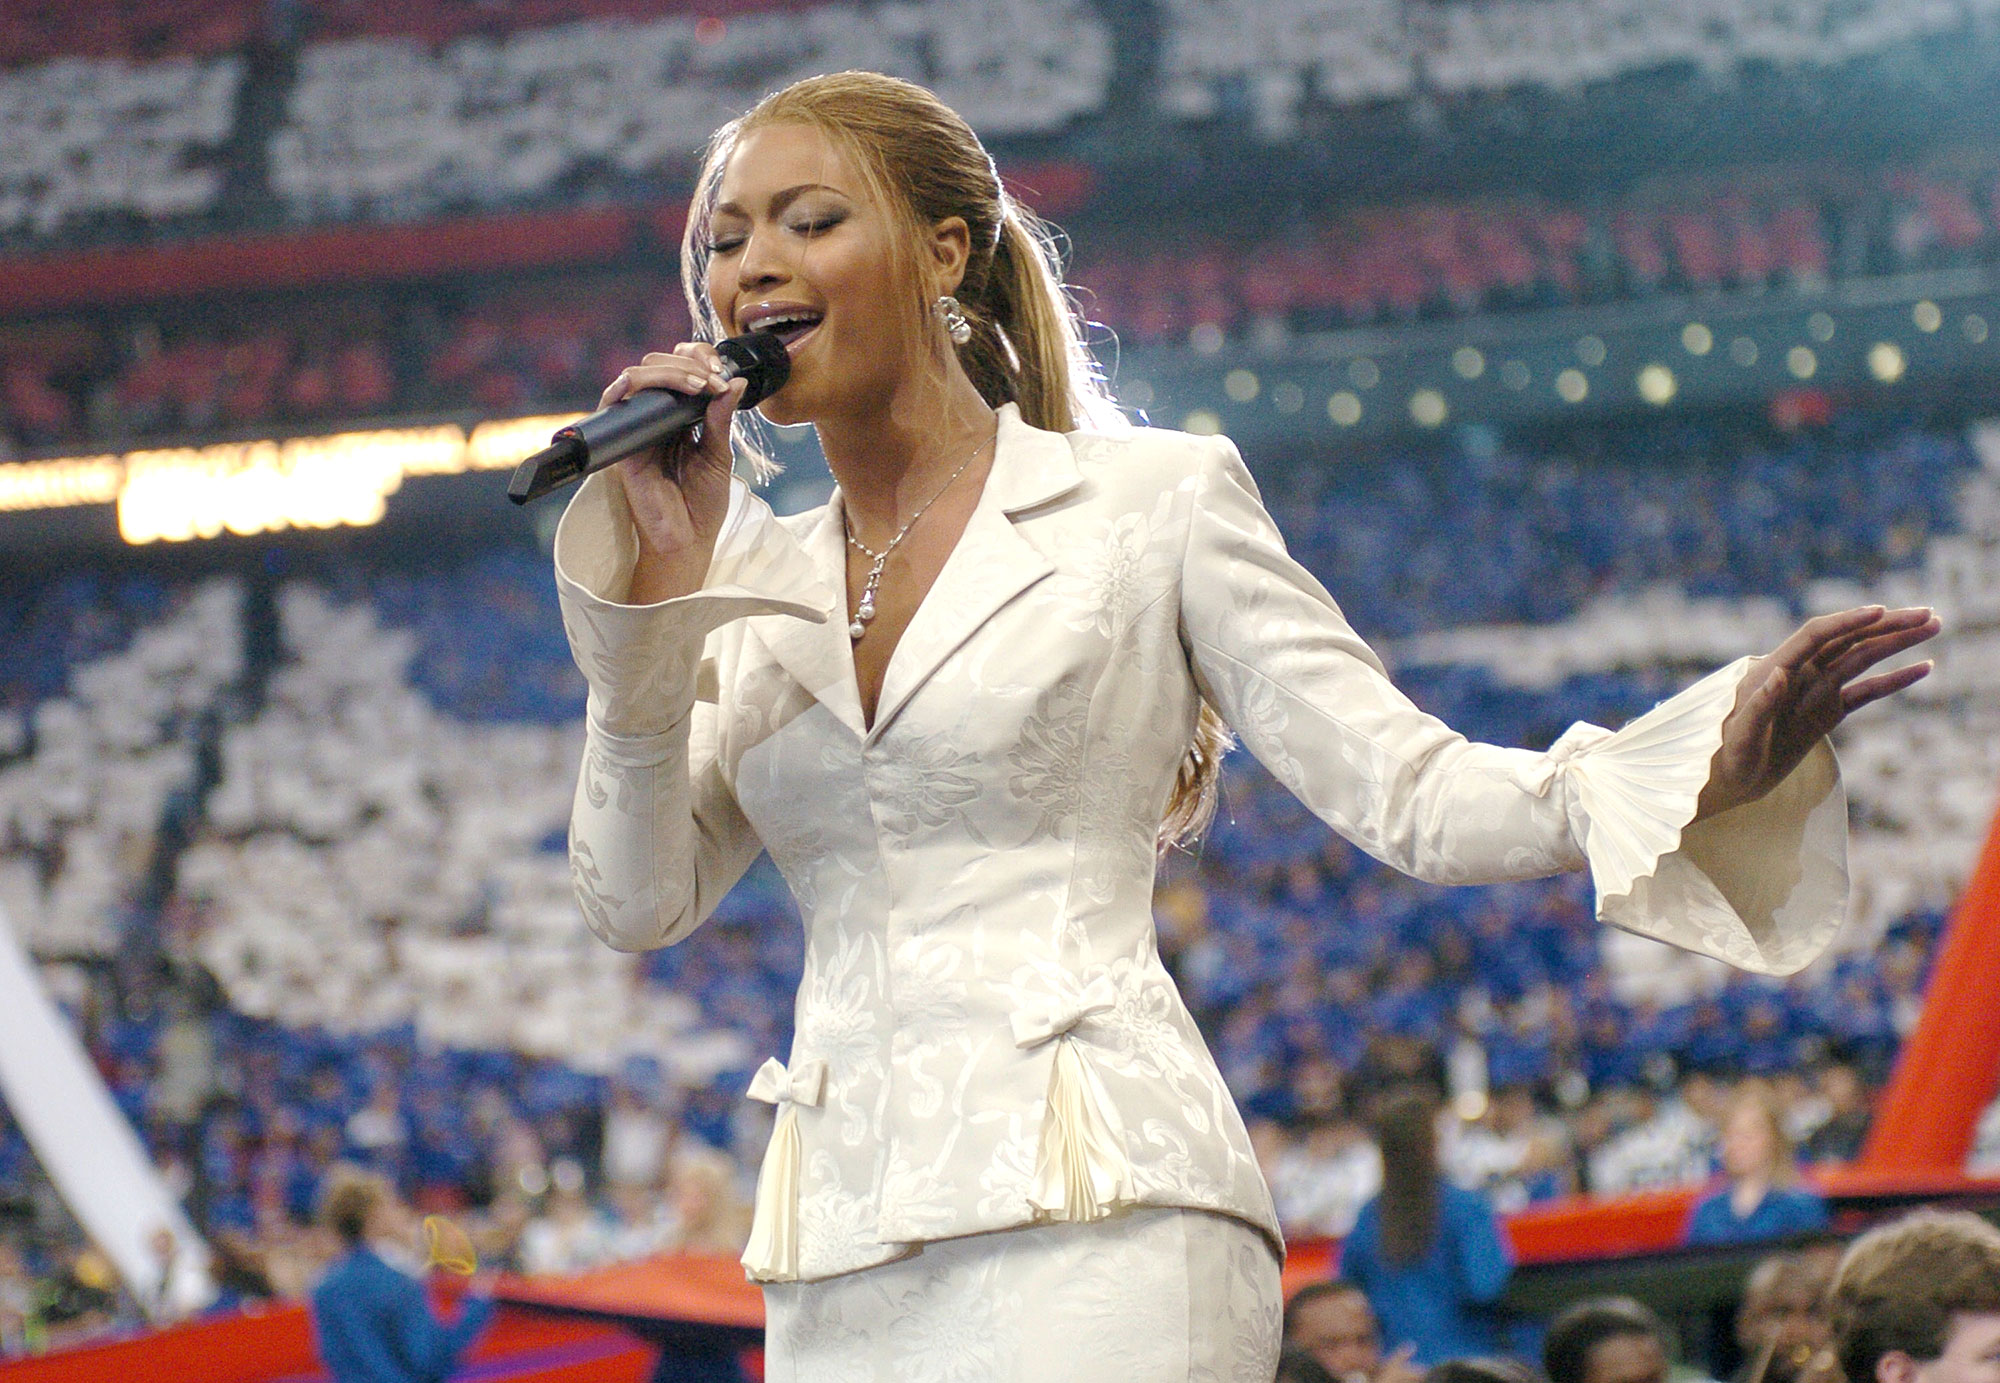 afaa94c9f Best Super Bowl National Anthem Performances: Beyonce, Gaga, More